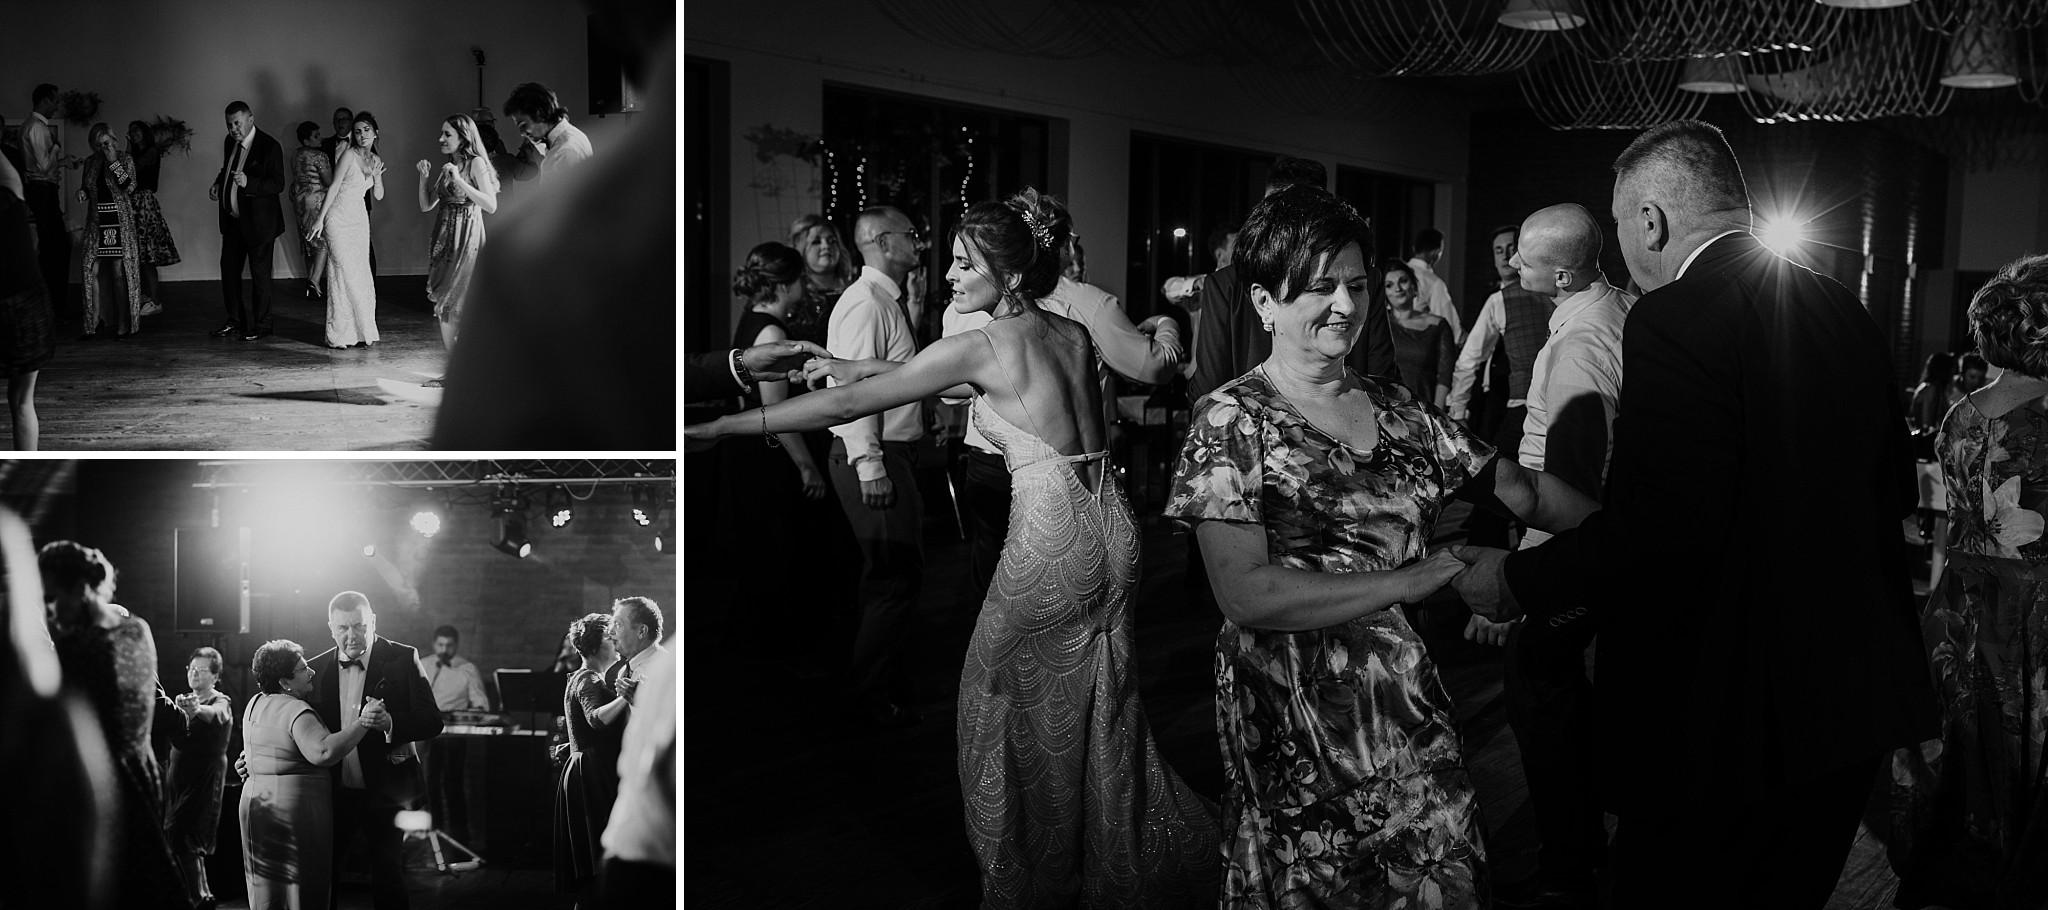 fotograf poznan wesele dobra truskawka piekne wesele pod poznaniem wesele w dobrej truskawce piekna para mloda slub marzen slub koronawirus slub listopad wesele koronawirus 480